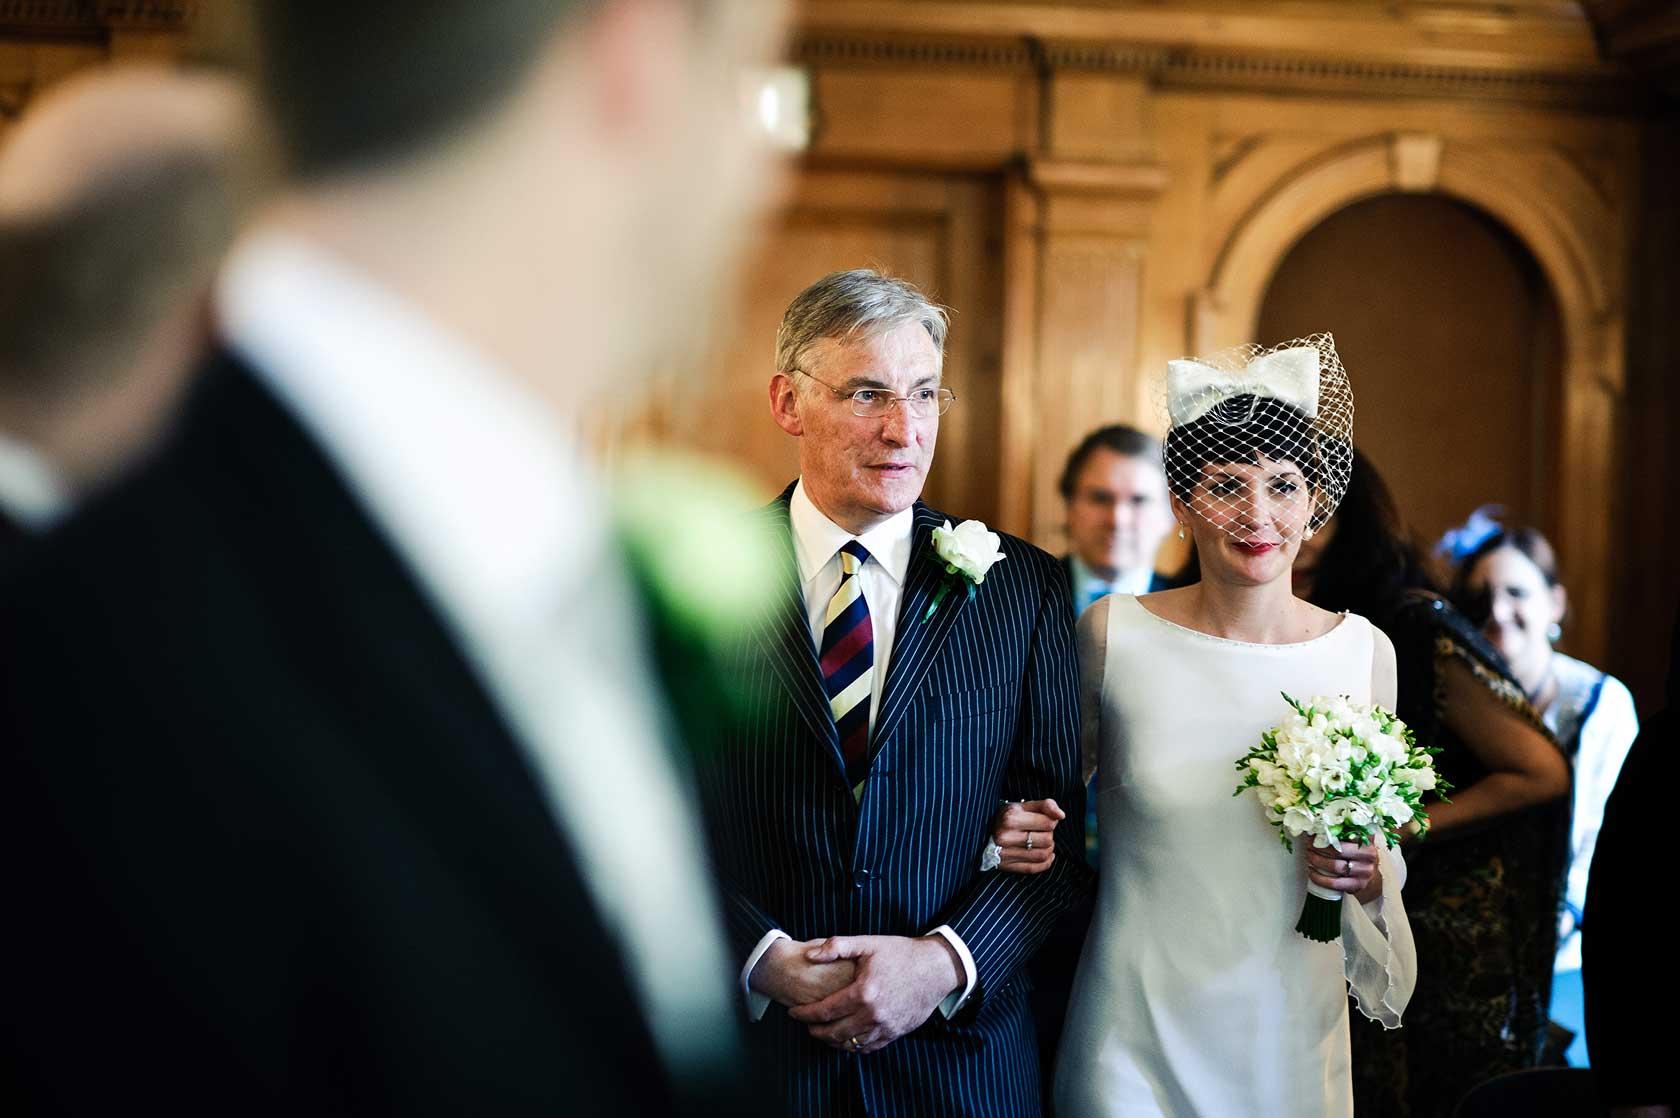 Wedding Photographer at Burgh House